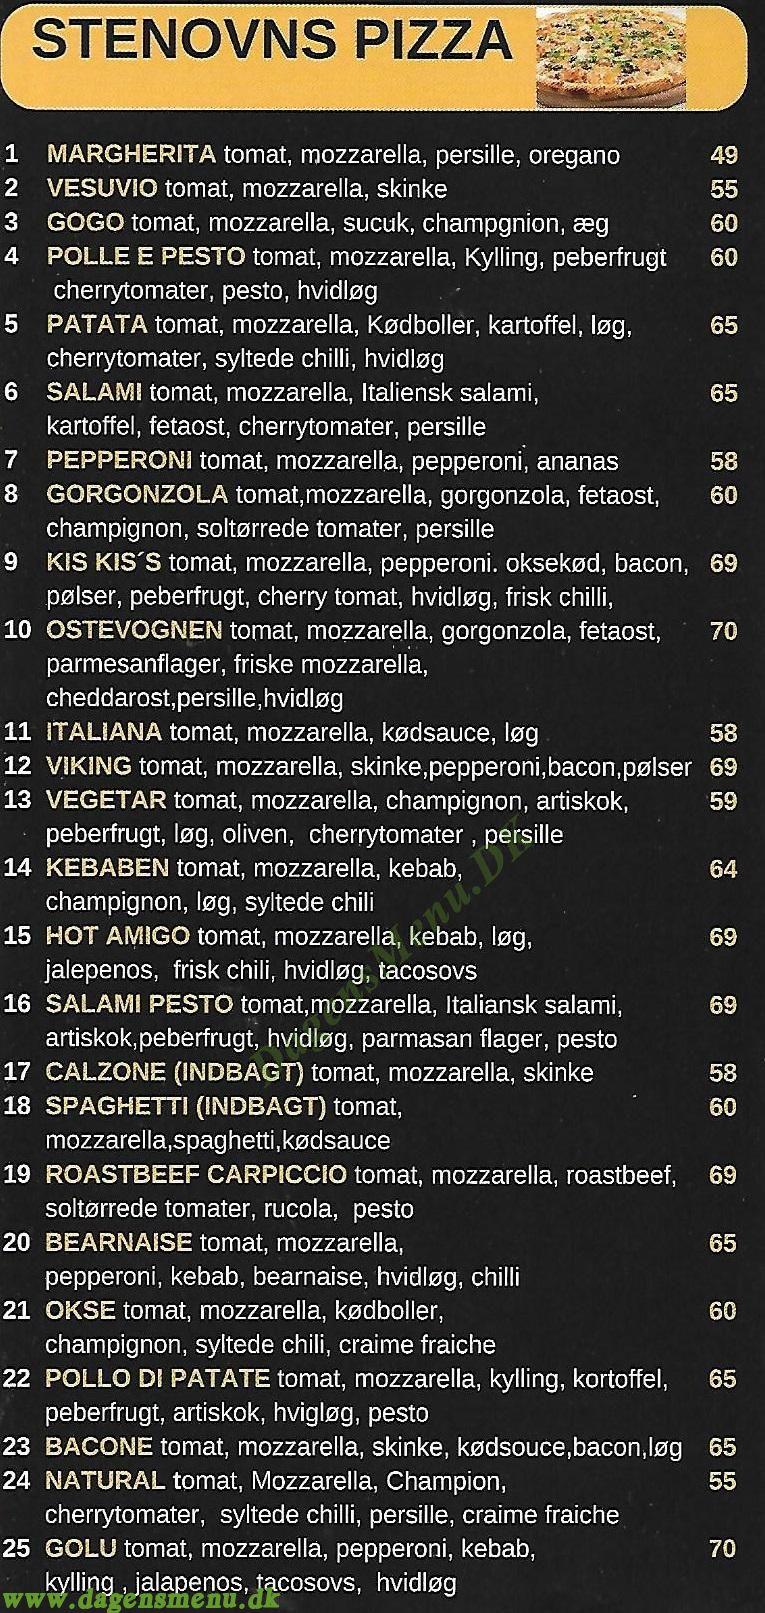 PizzaTit - Stenovn - Menukort